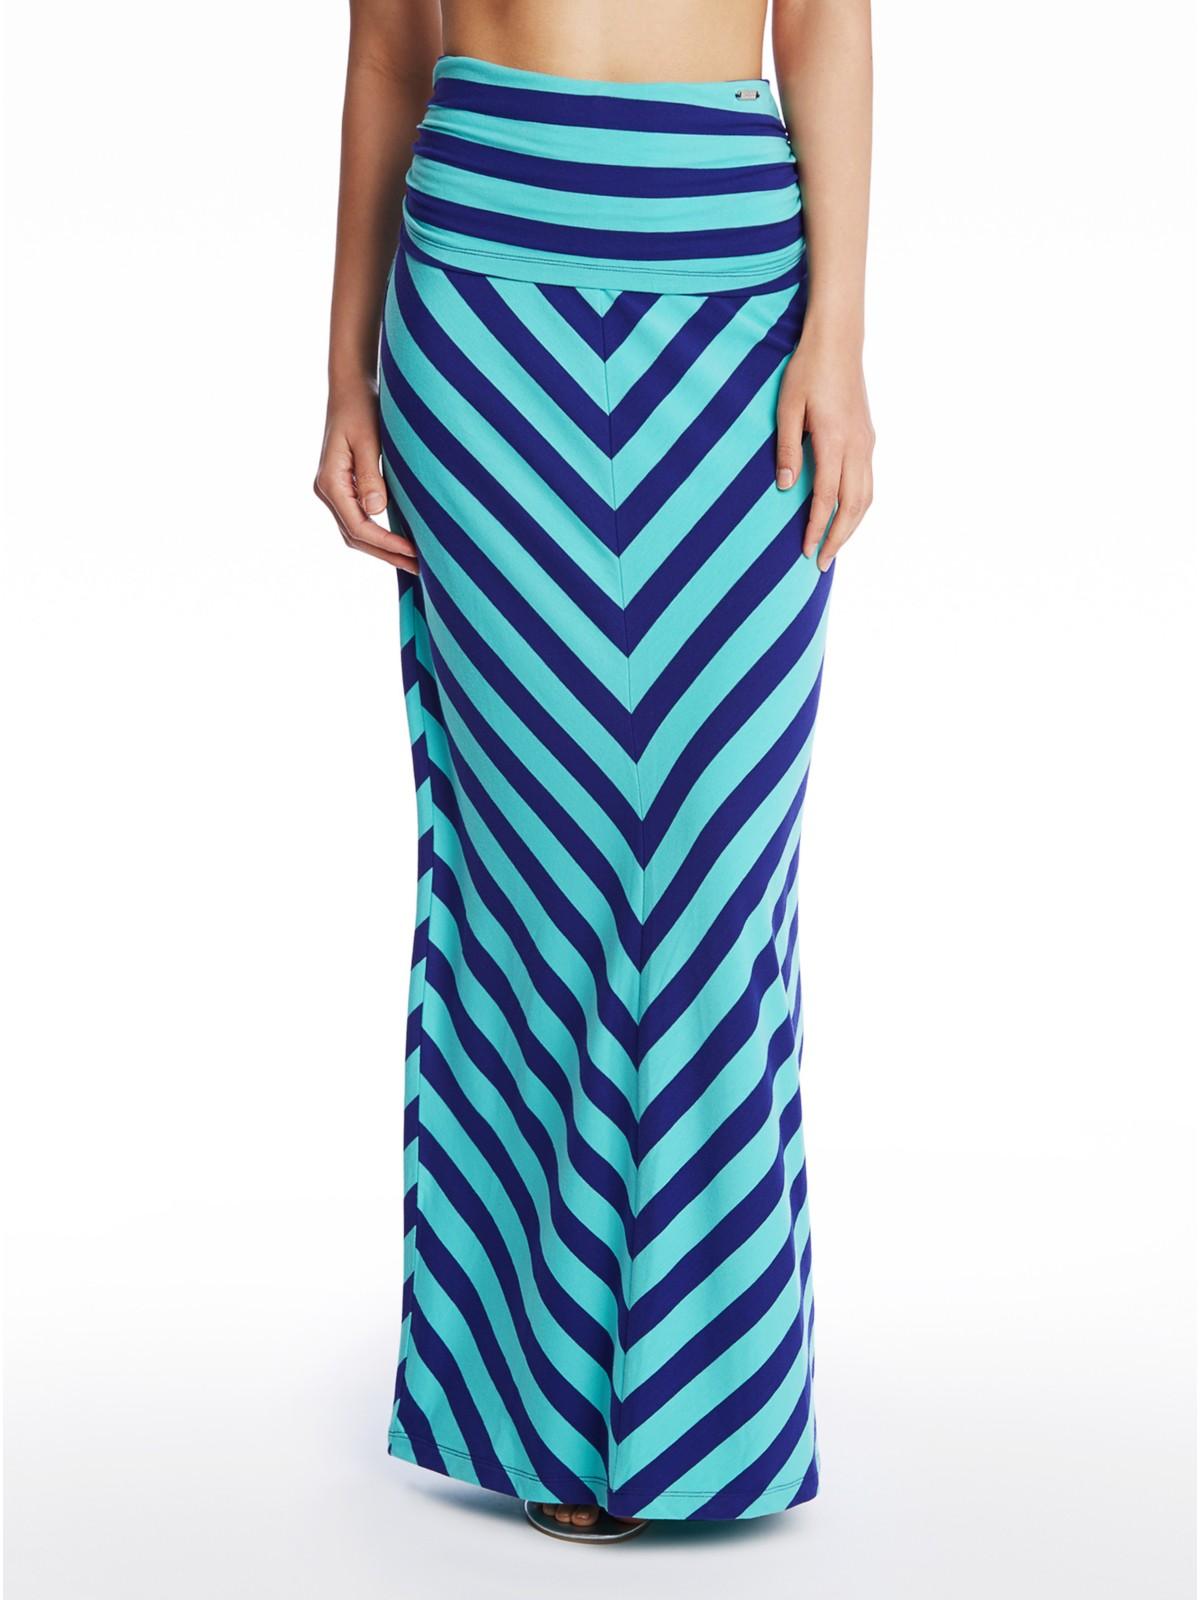 guess sansa chevron striped maxi skirt ebay